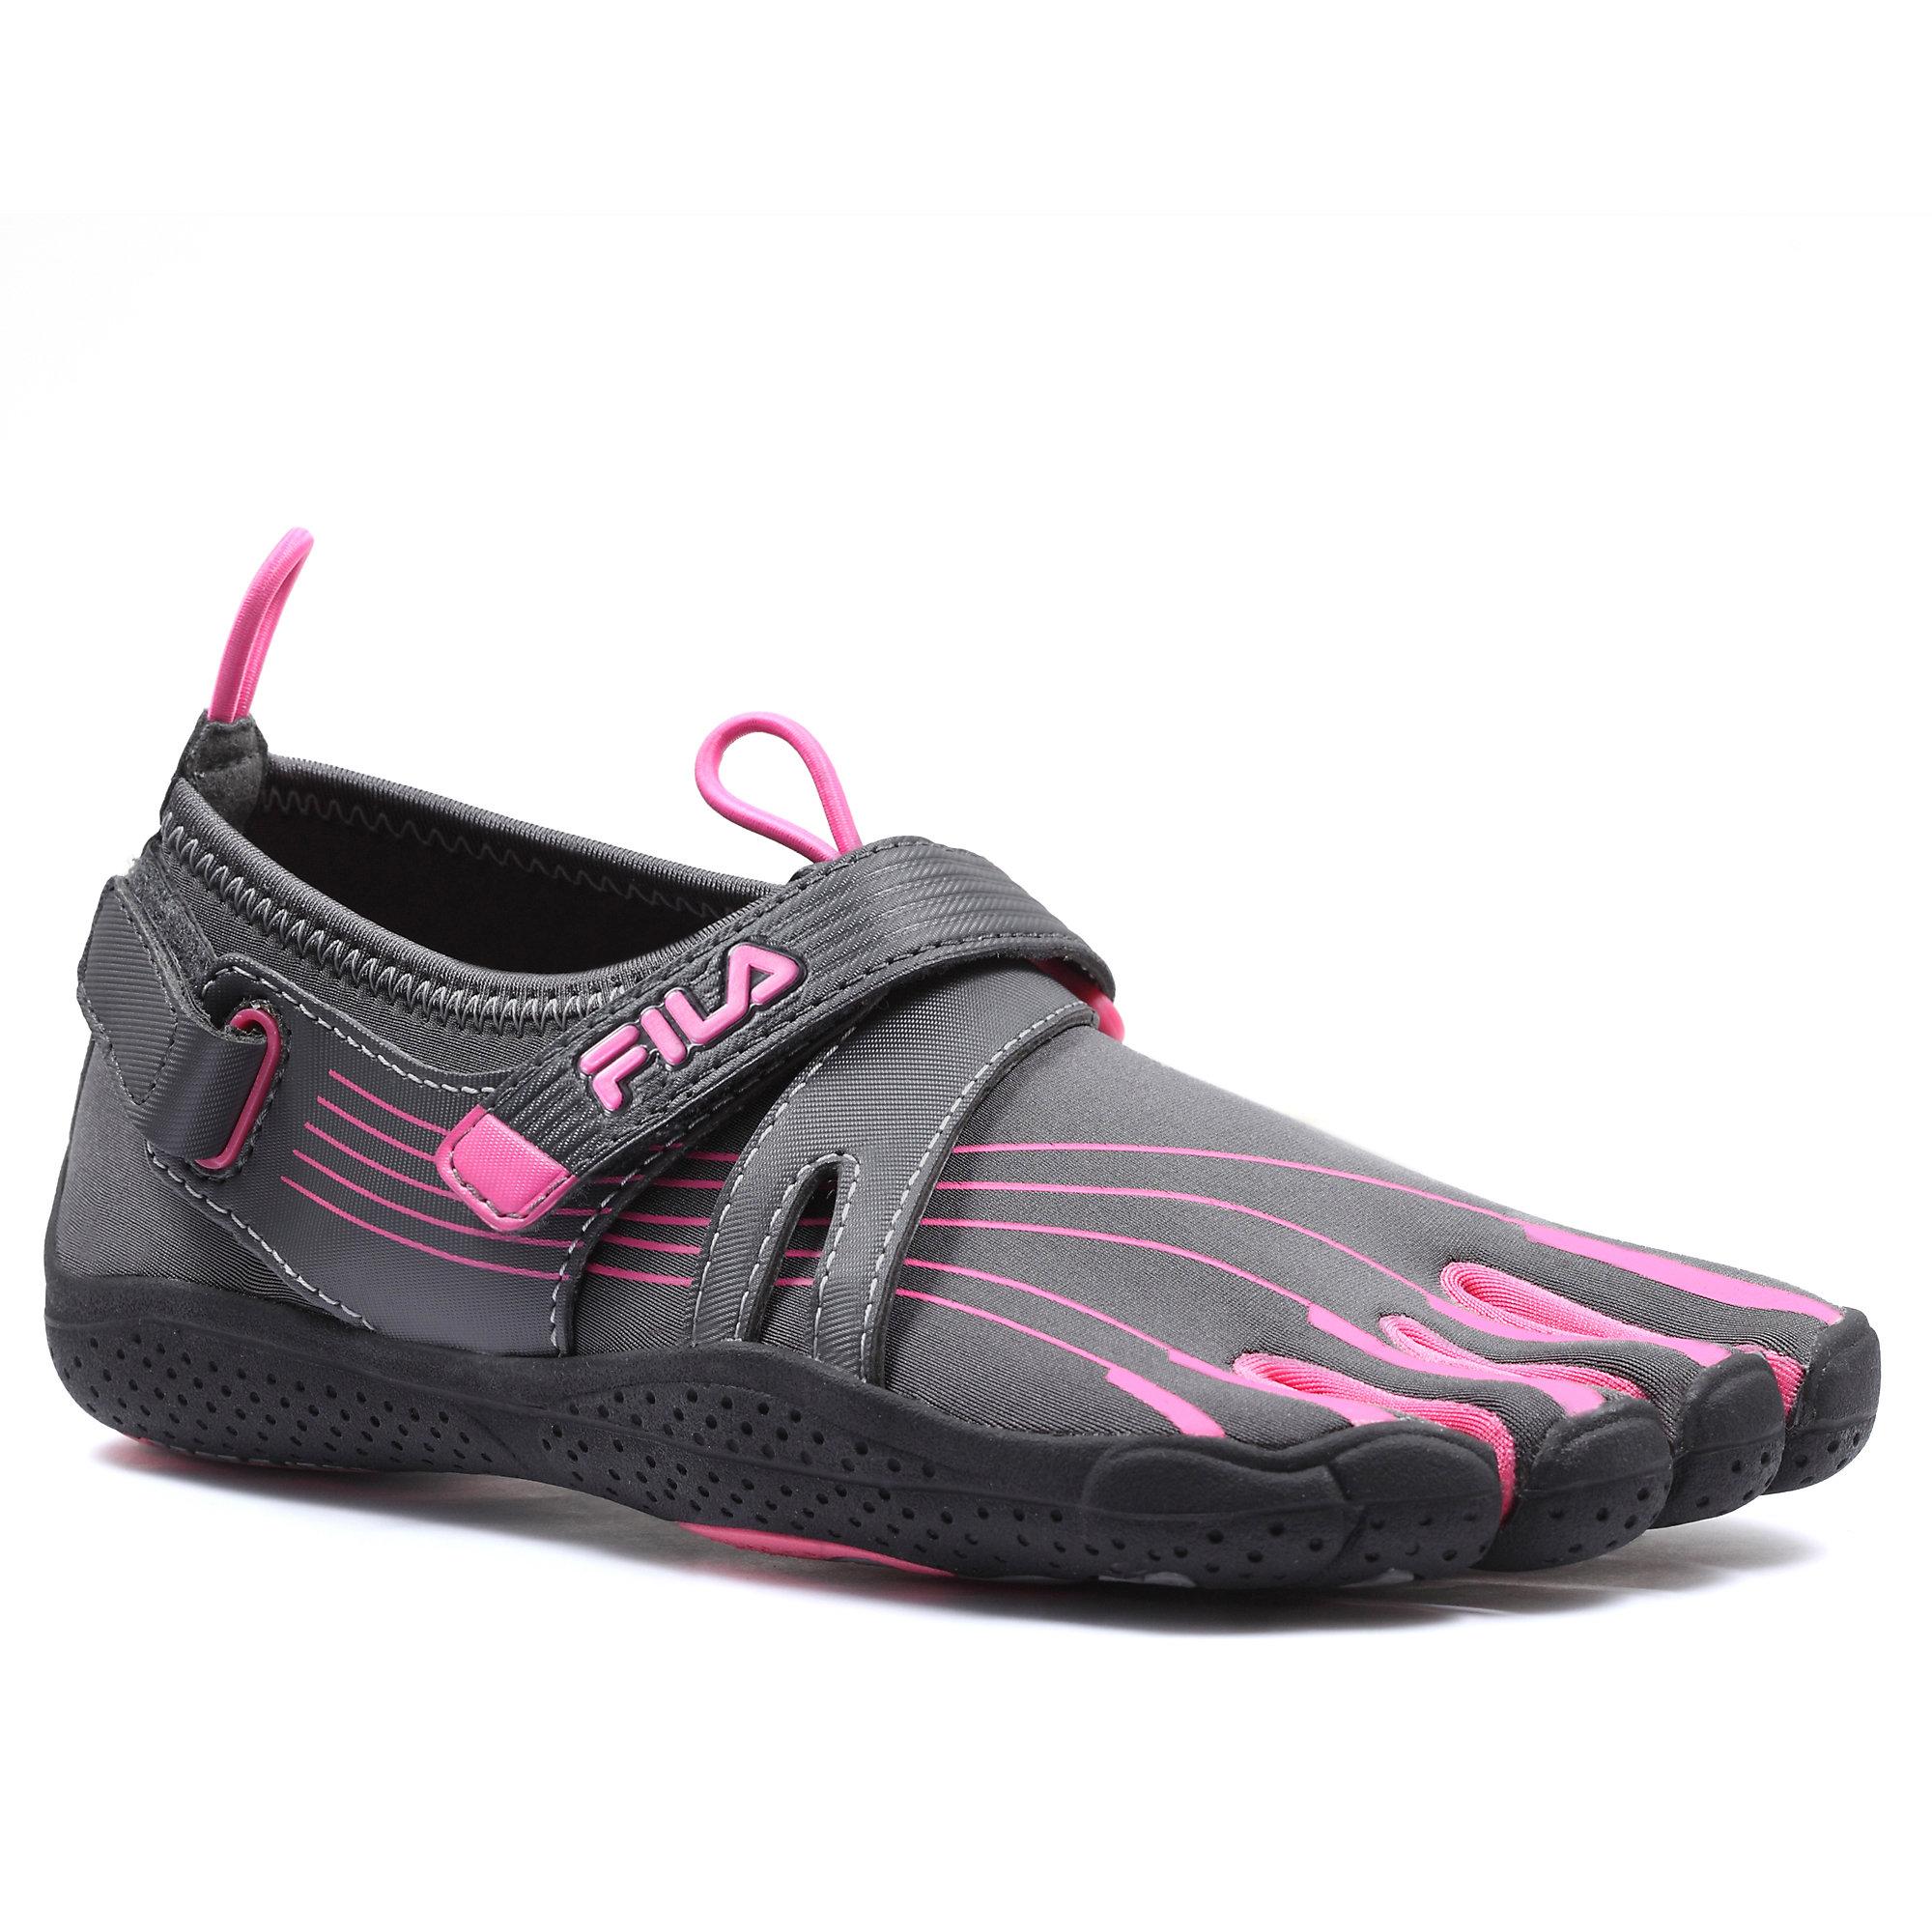 FILA-Womens-Skele-toes-EZ-Slide-Shoes